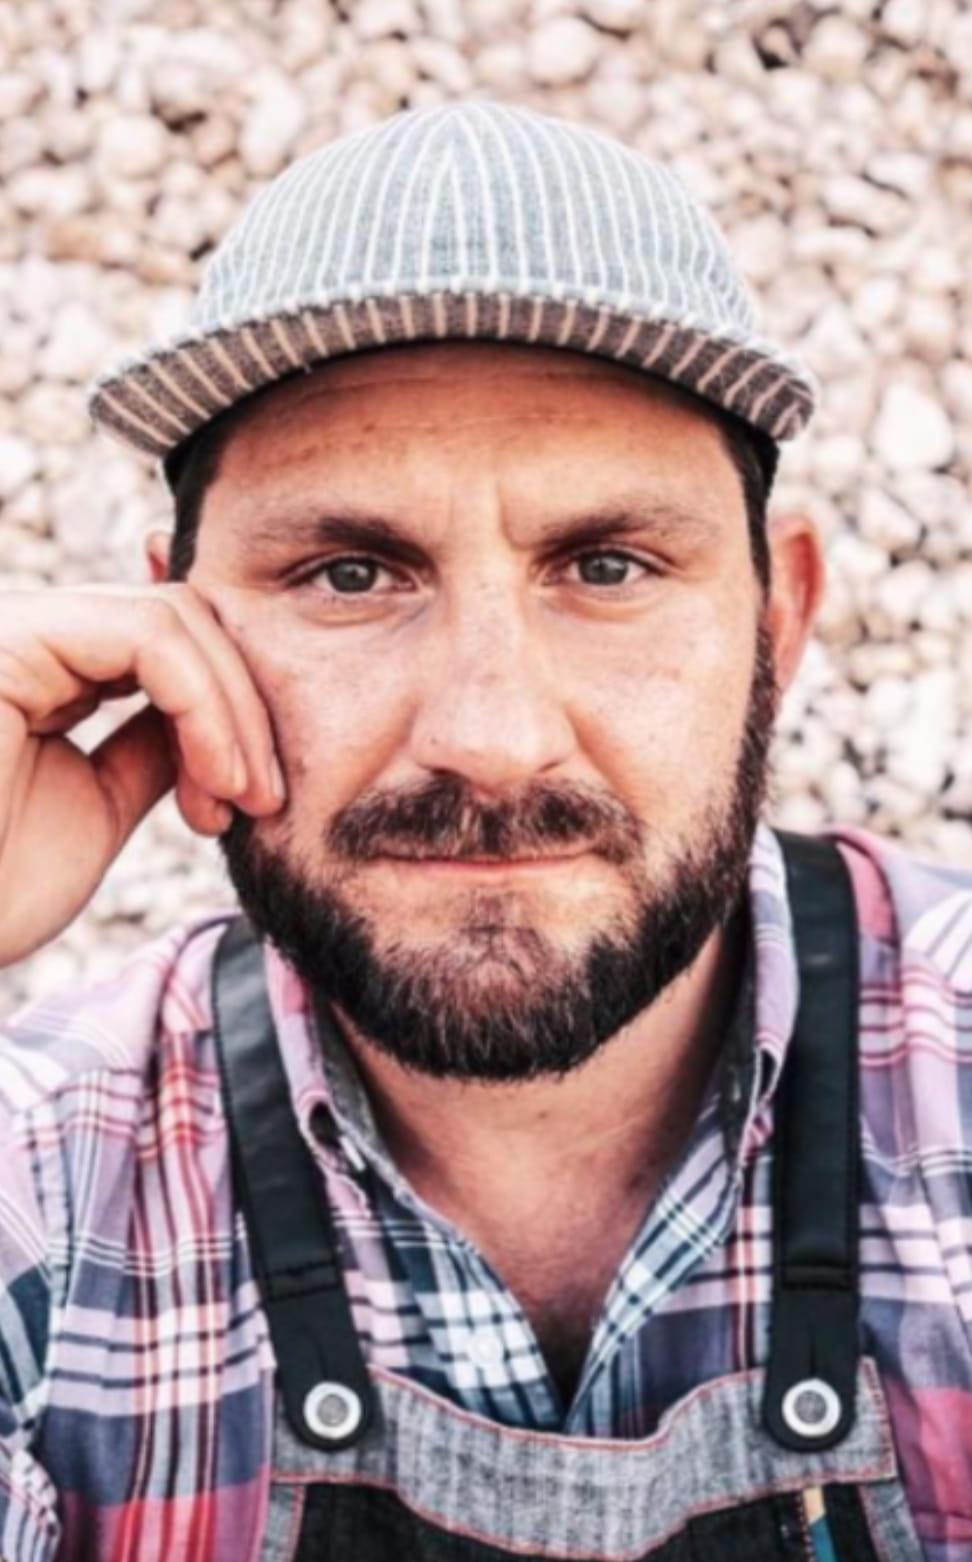 Chef Gabe Erales Headshot